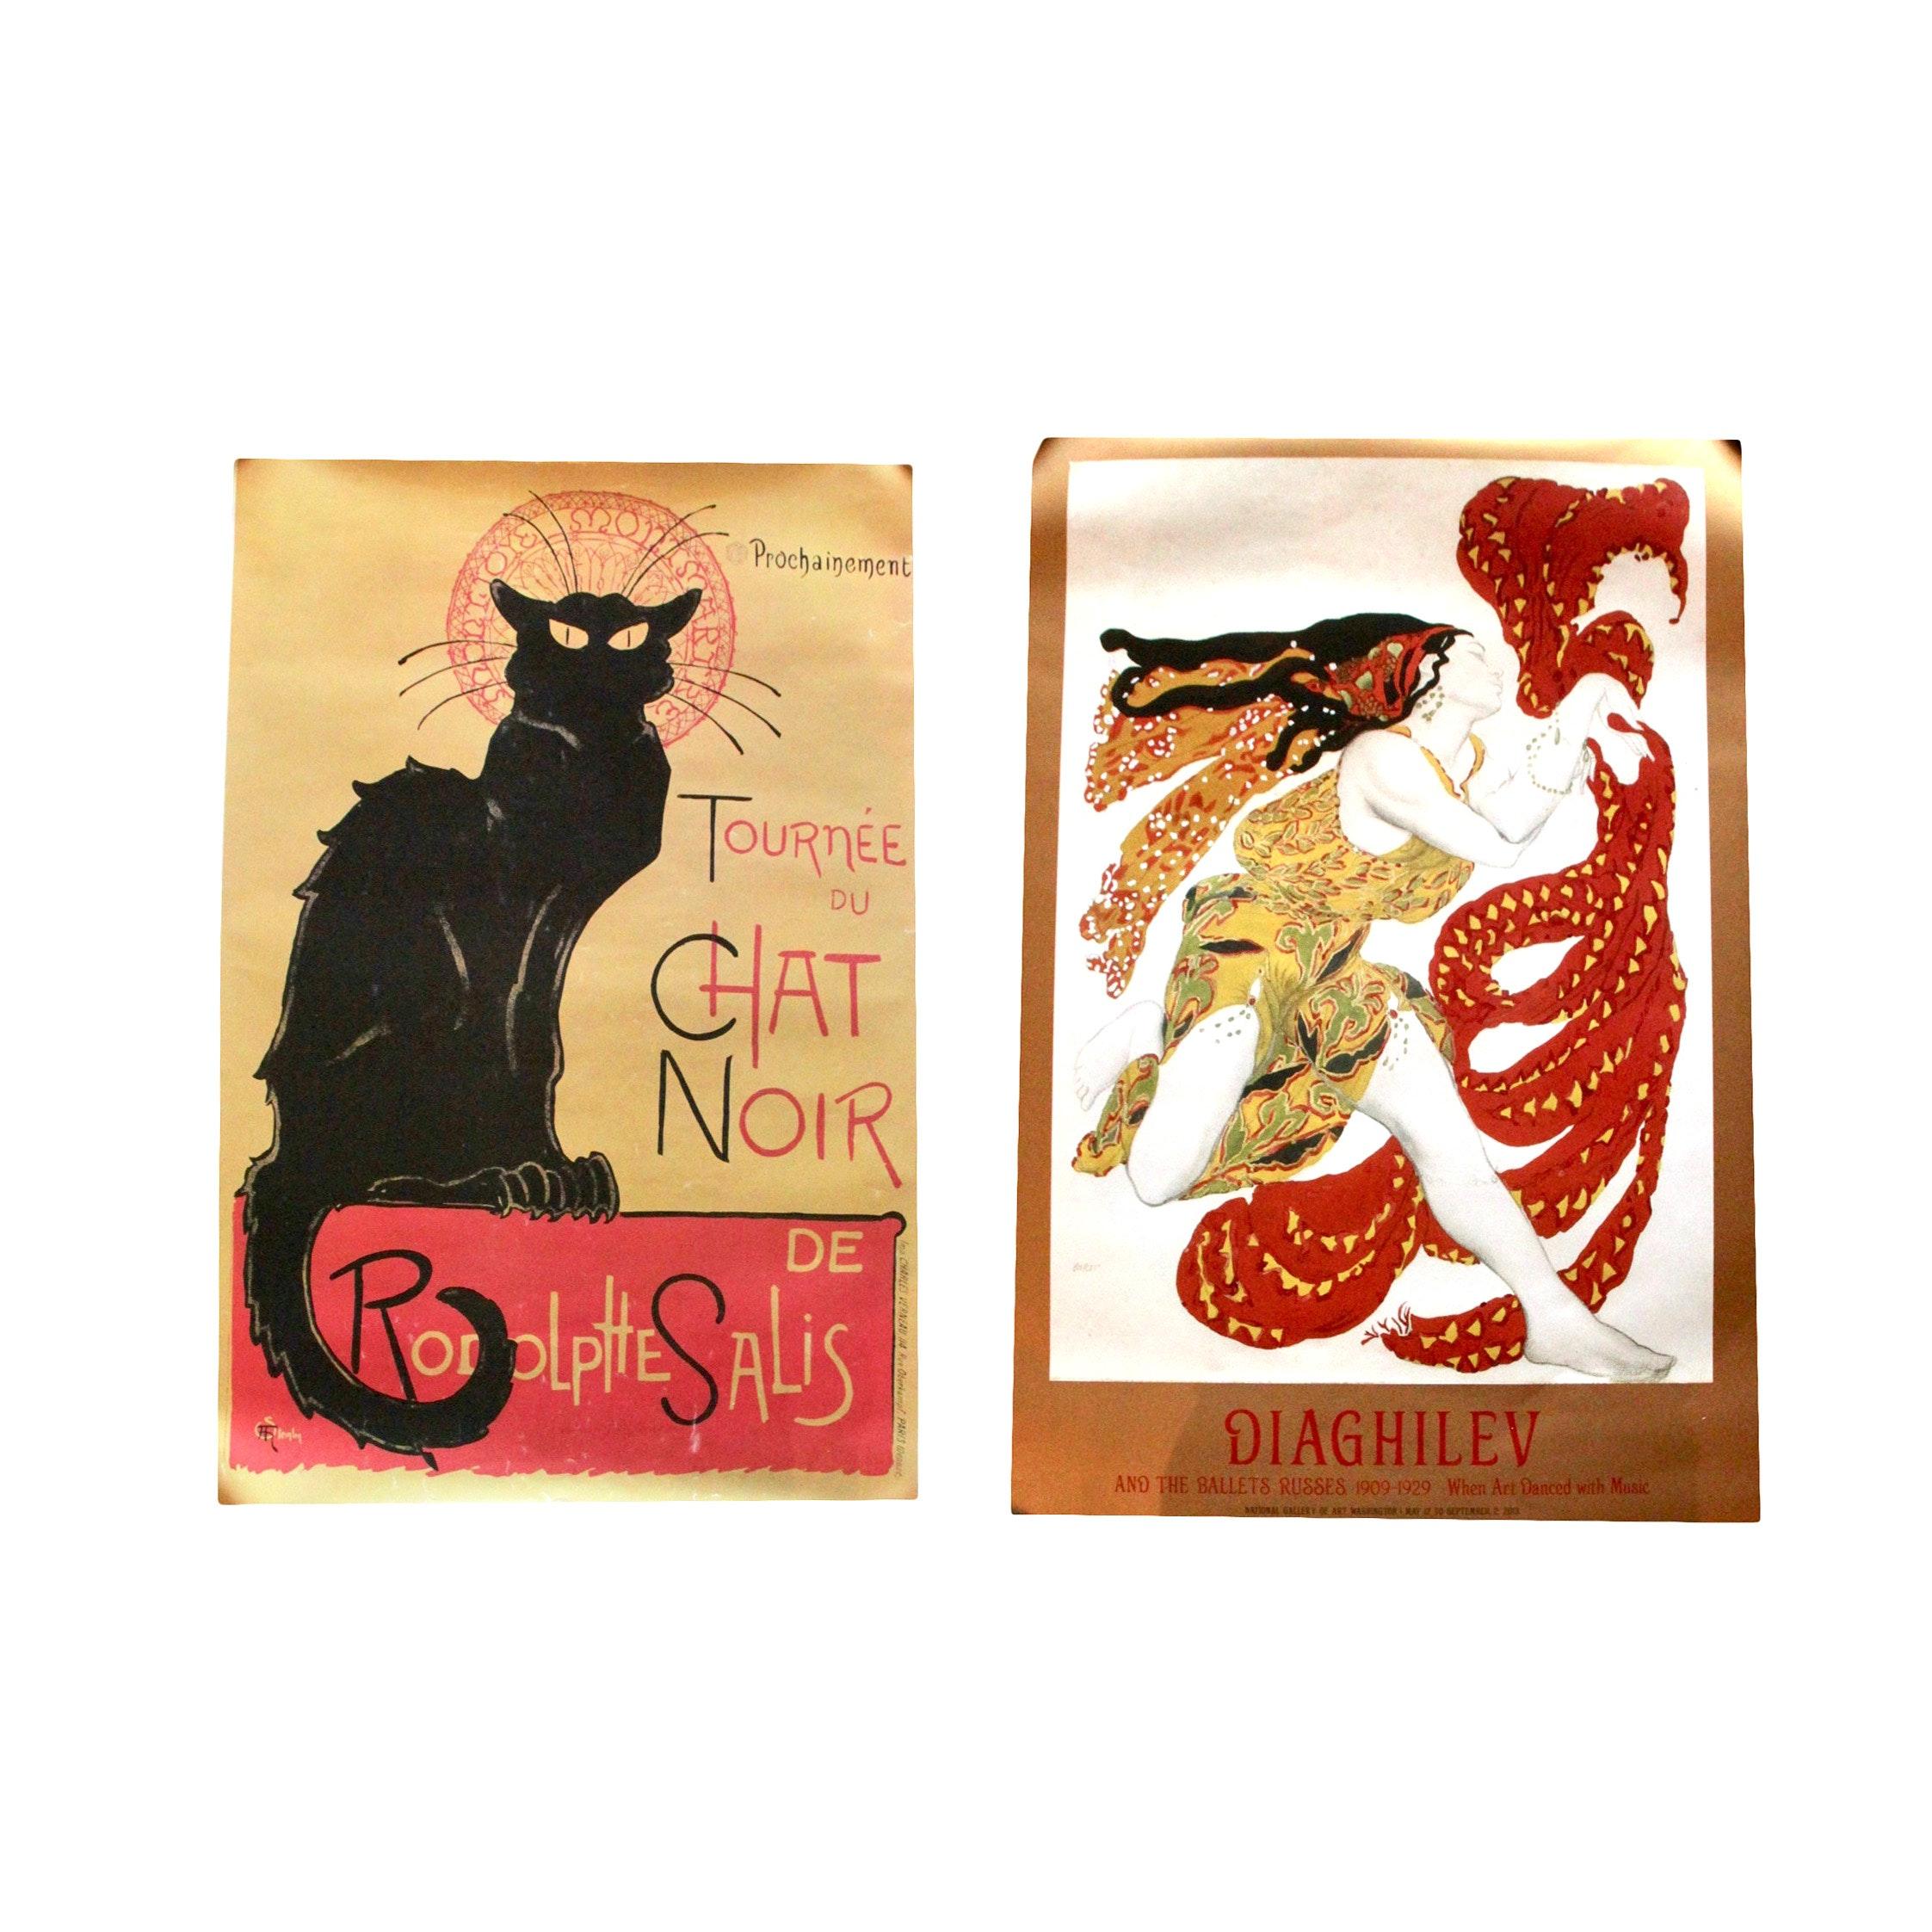 Offset Lithograph Art Poster Prints